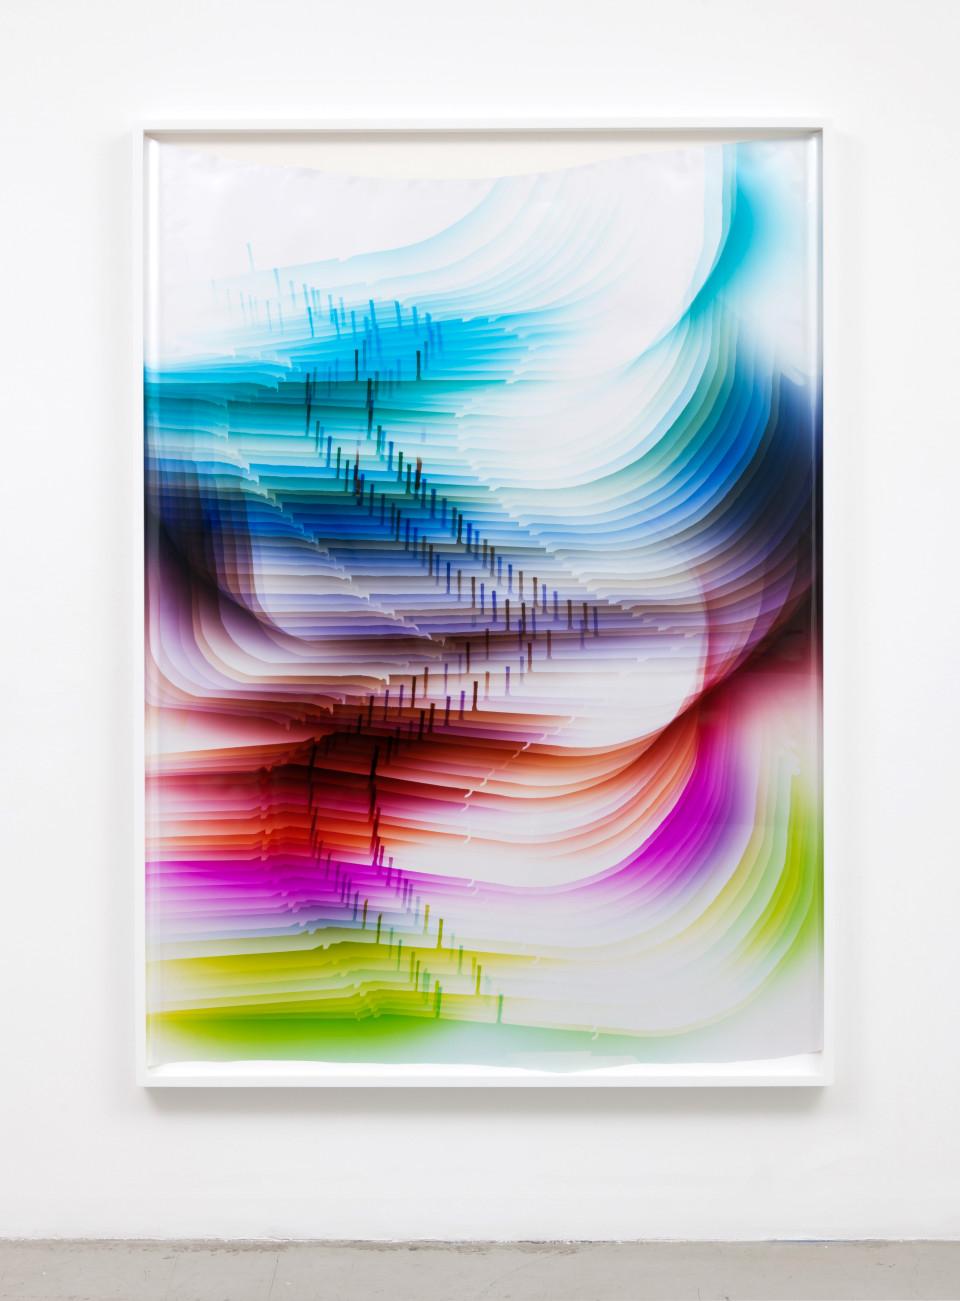 Image: Mariah Robertson  219, 2017  unique chromogenic print  68 x 49 inches (172.7 x 124.5 cm)